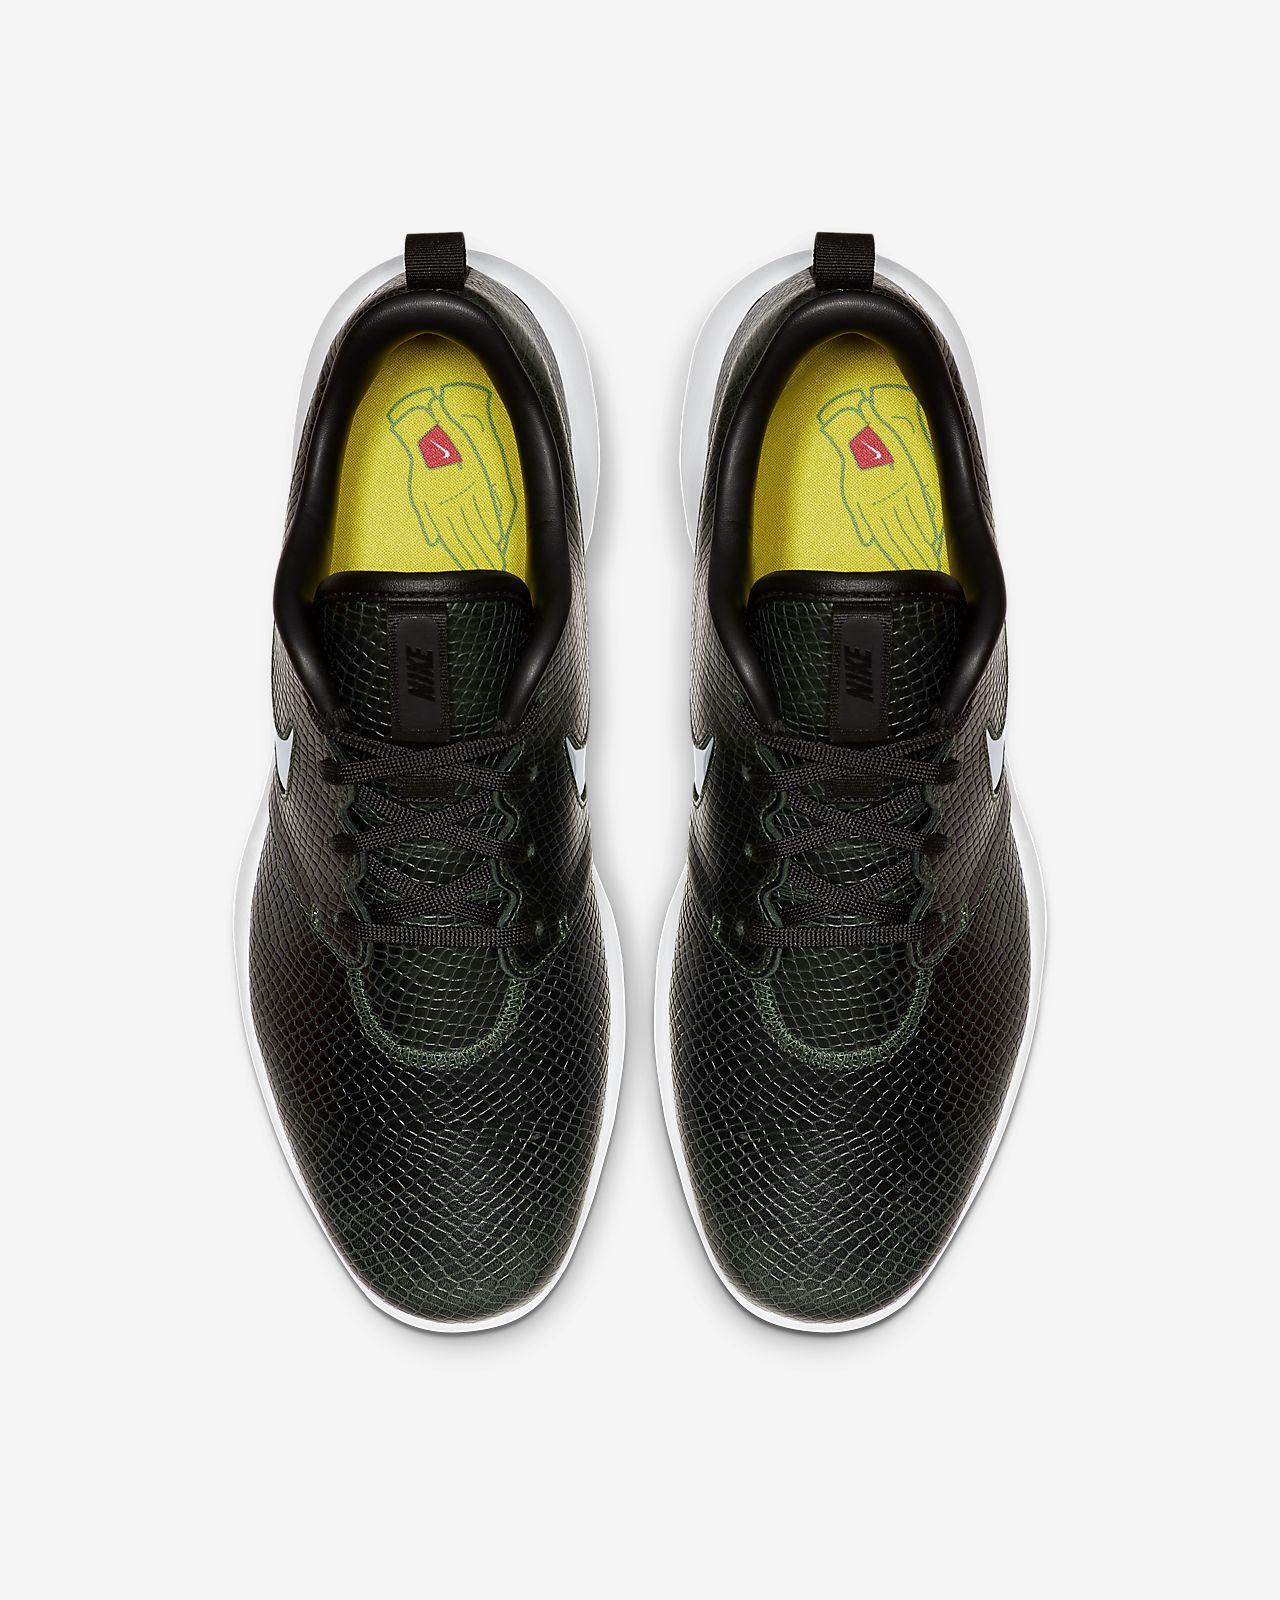 big sale e049f f34b8 ... Nike Roshe G Tour NRG Mens Golf Shoe